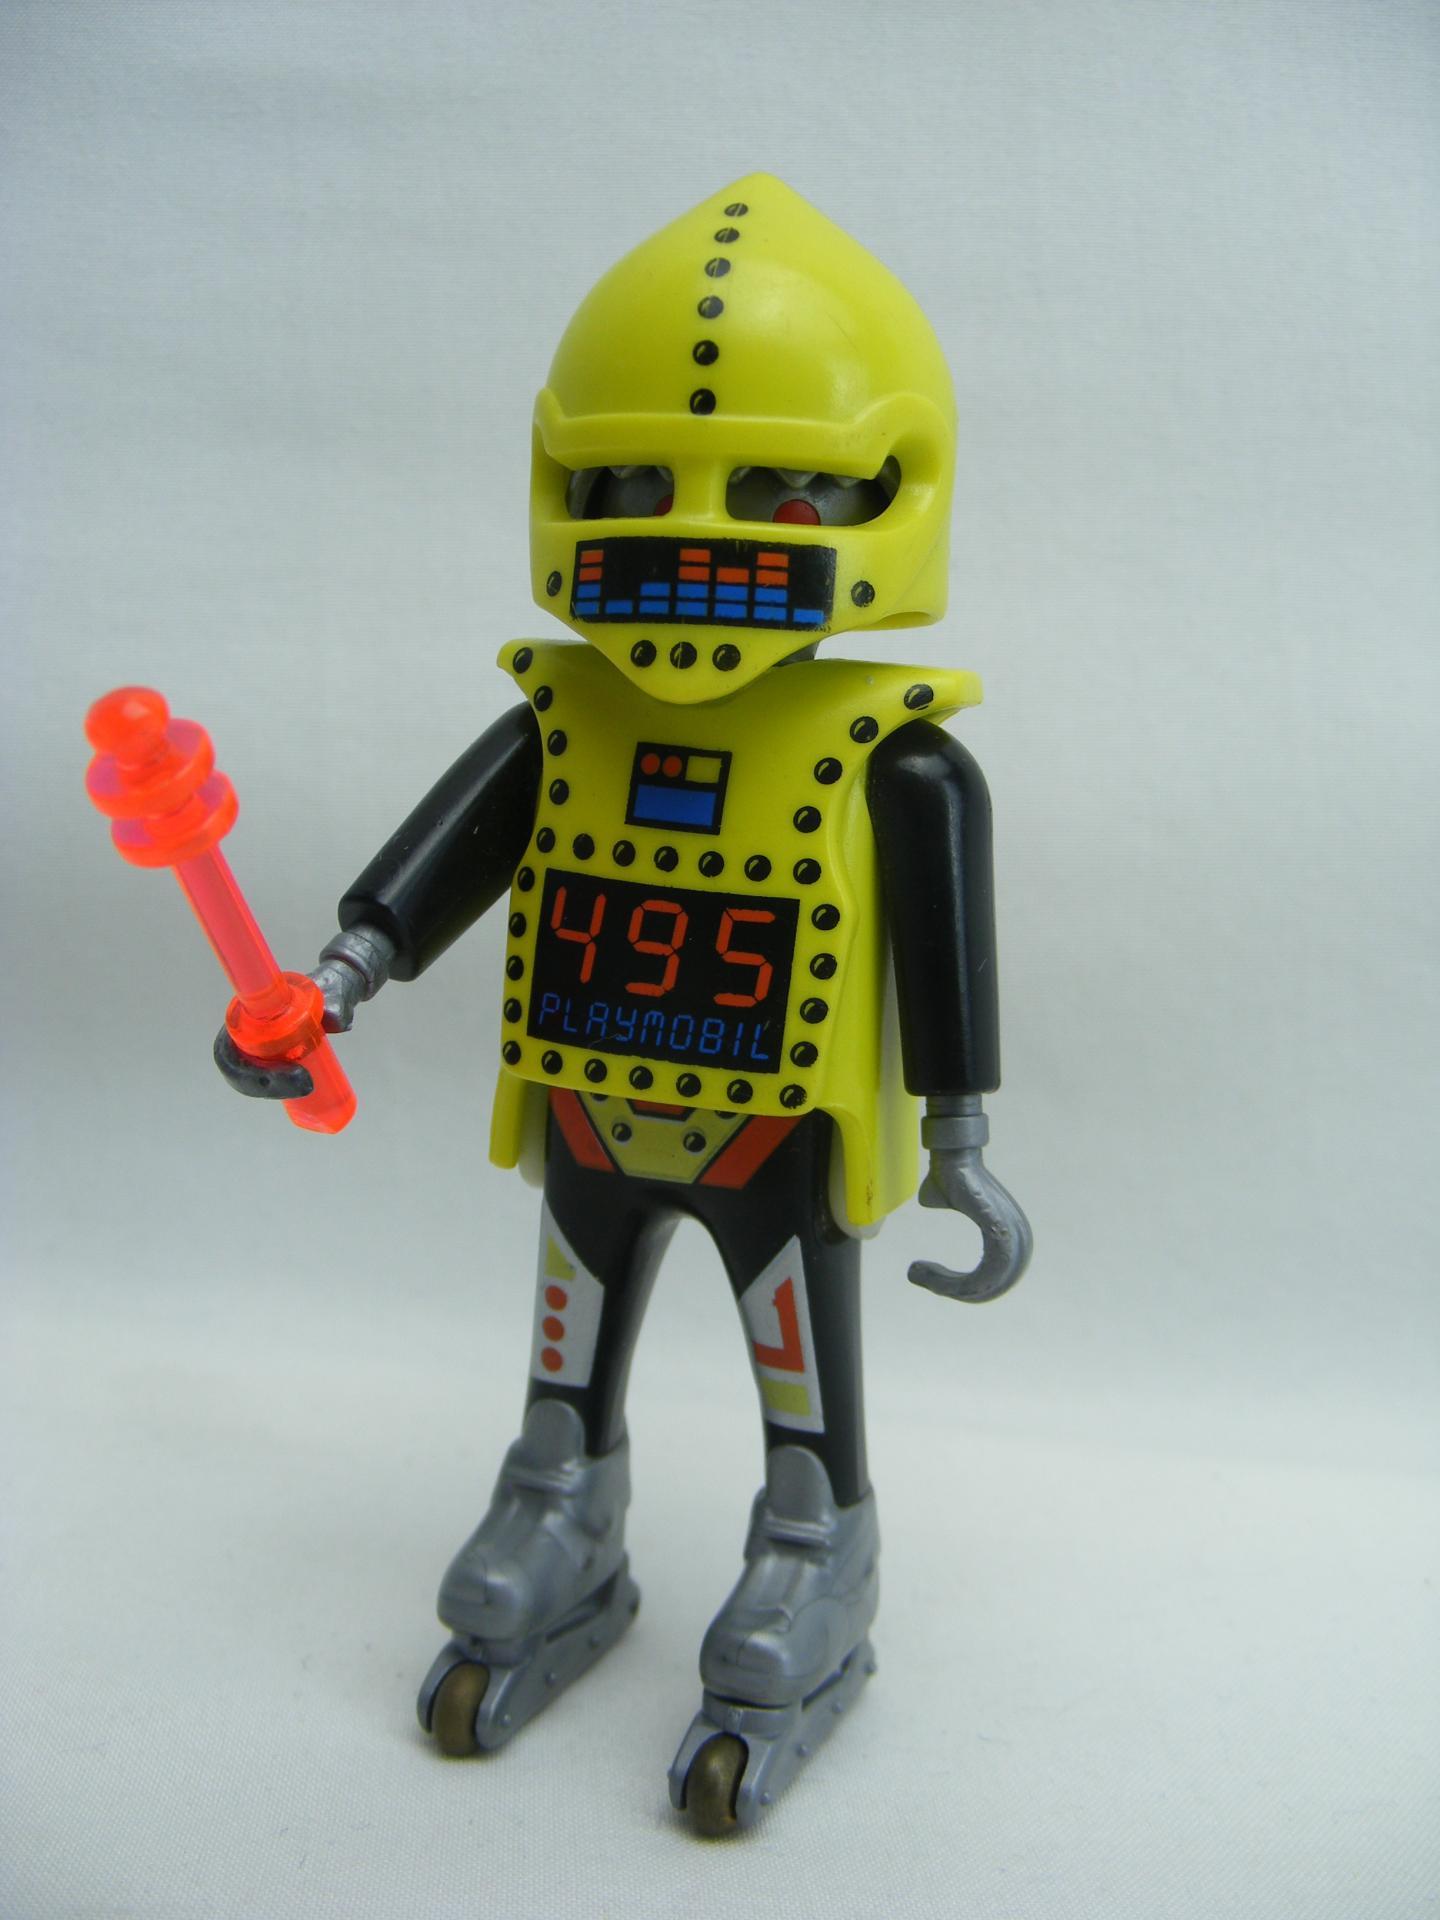 PLAYMOBIL 4604 SPECIAL ROBOT ESPACIAL (AÑO 2002)